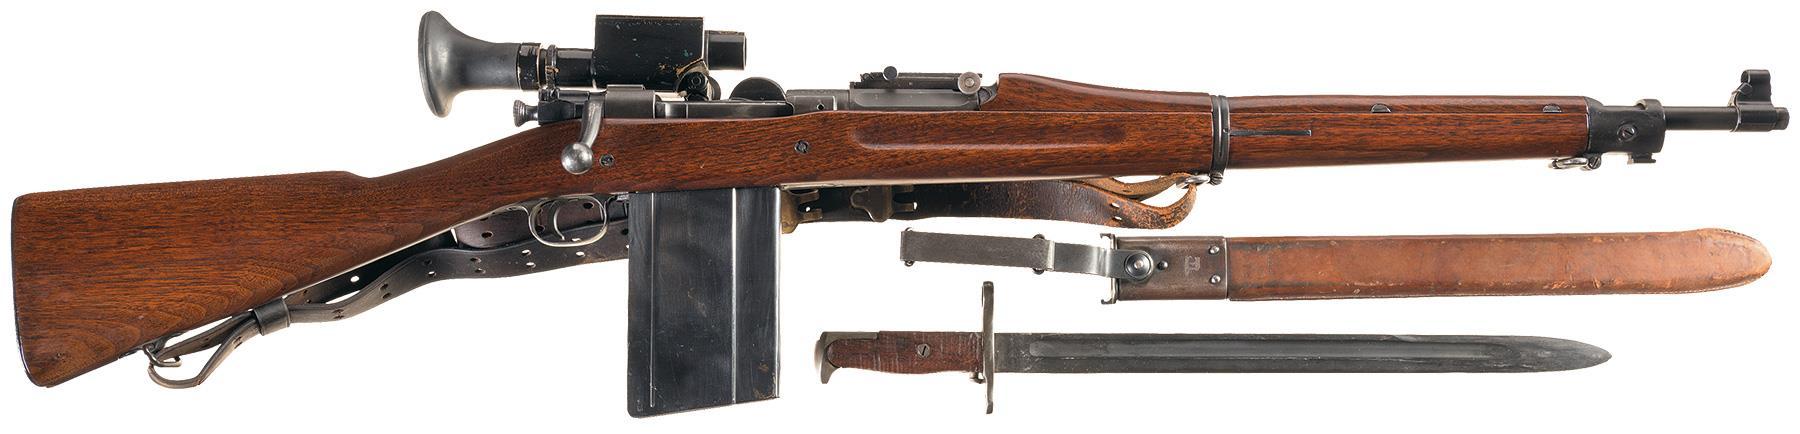 U S  Model 1903 Springfield Rifle with Model 1913 Sight